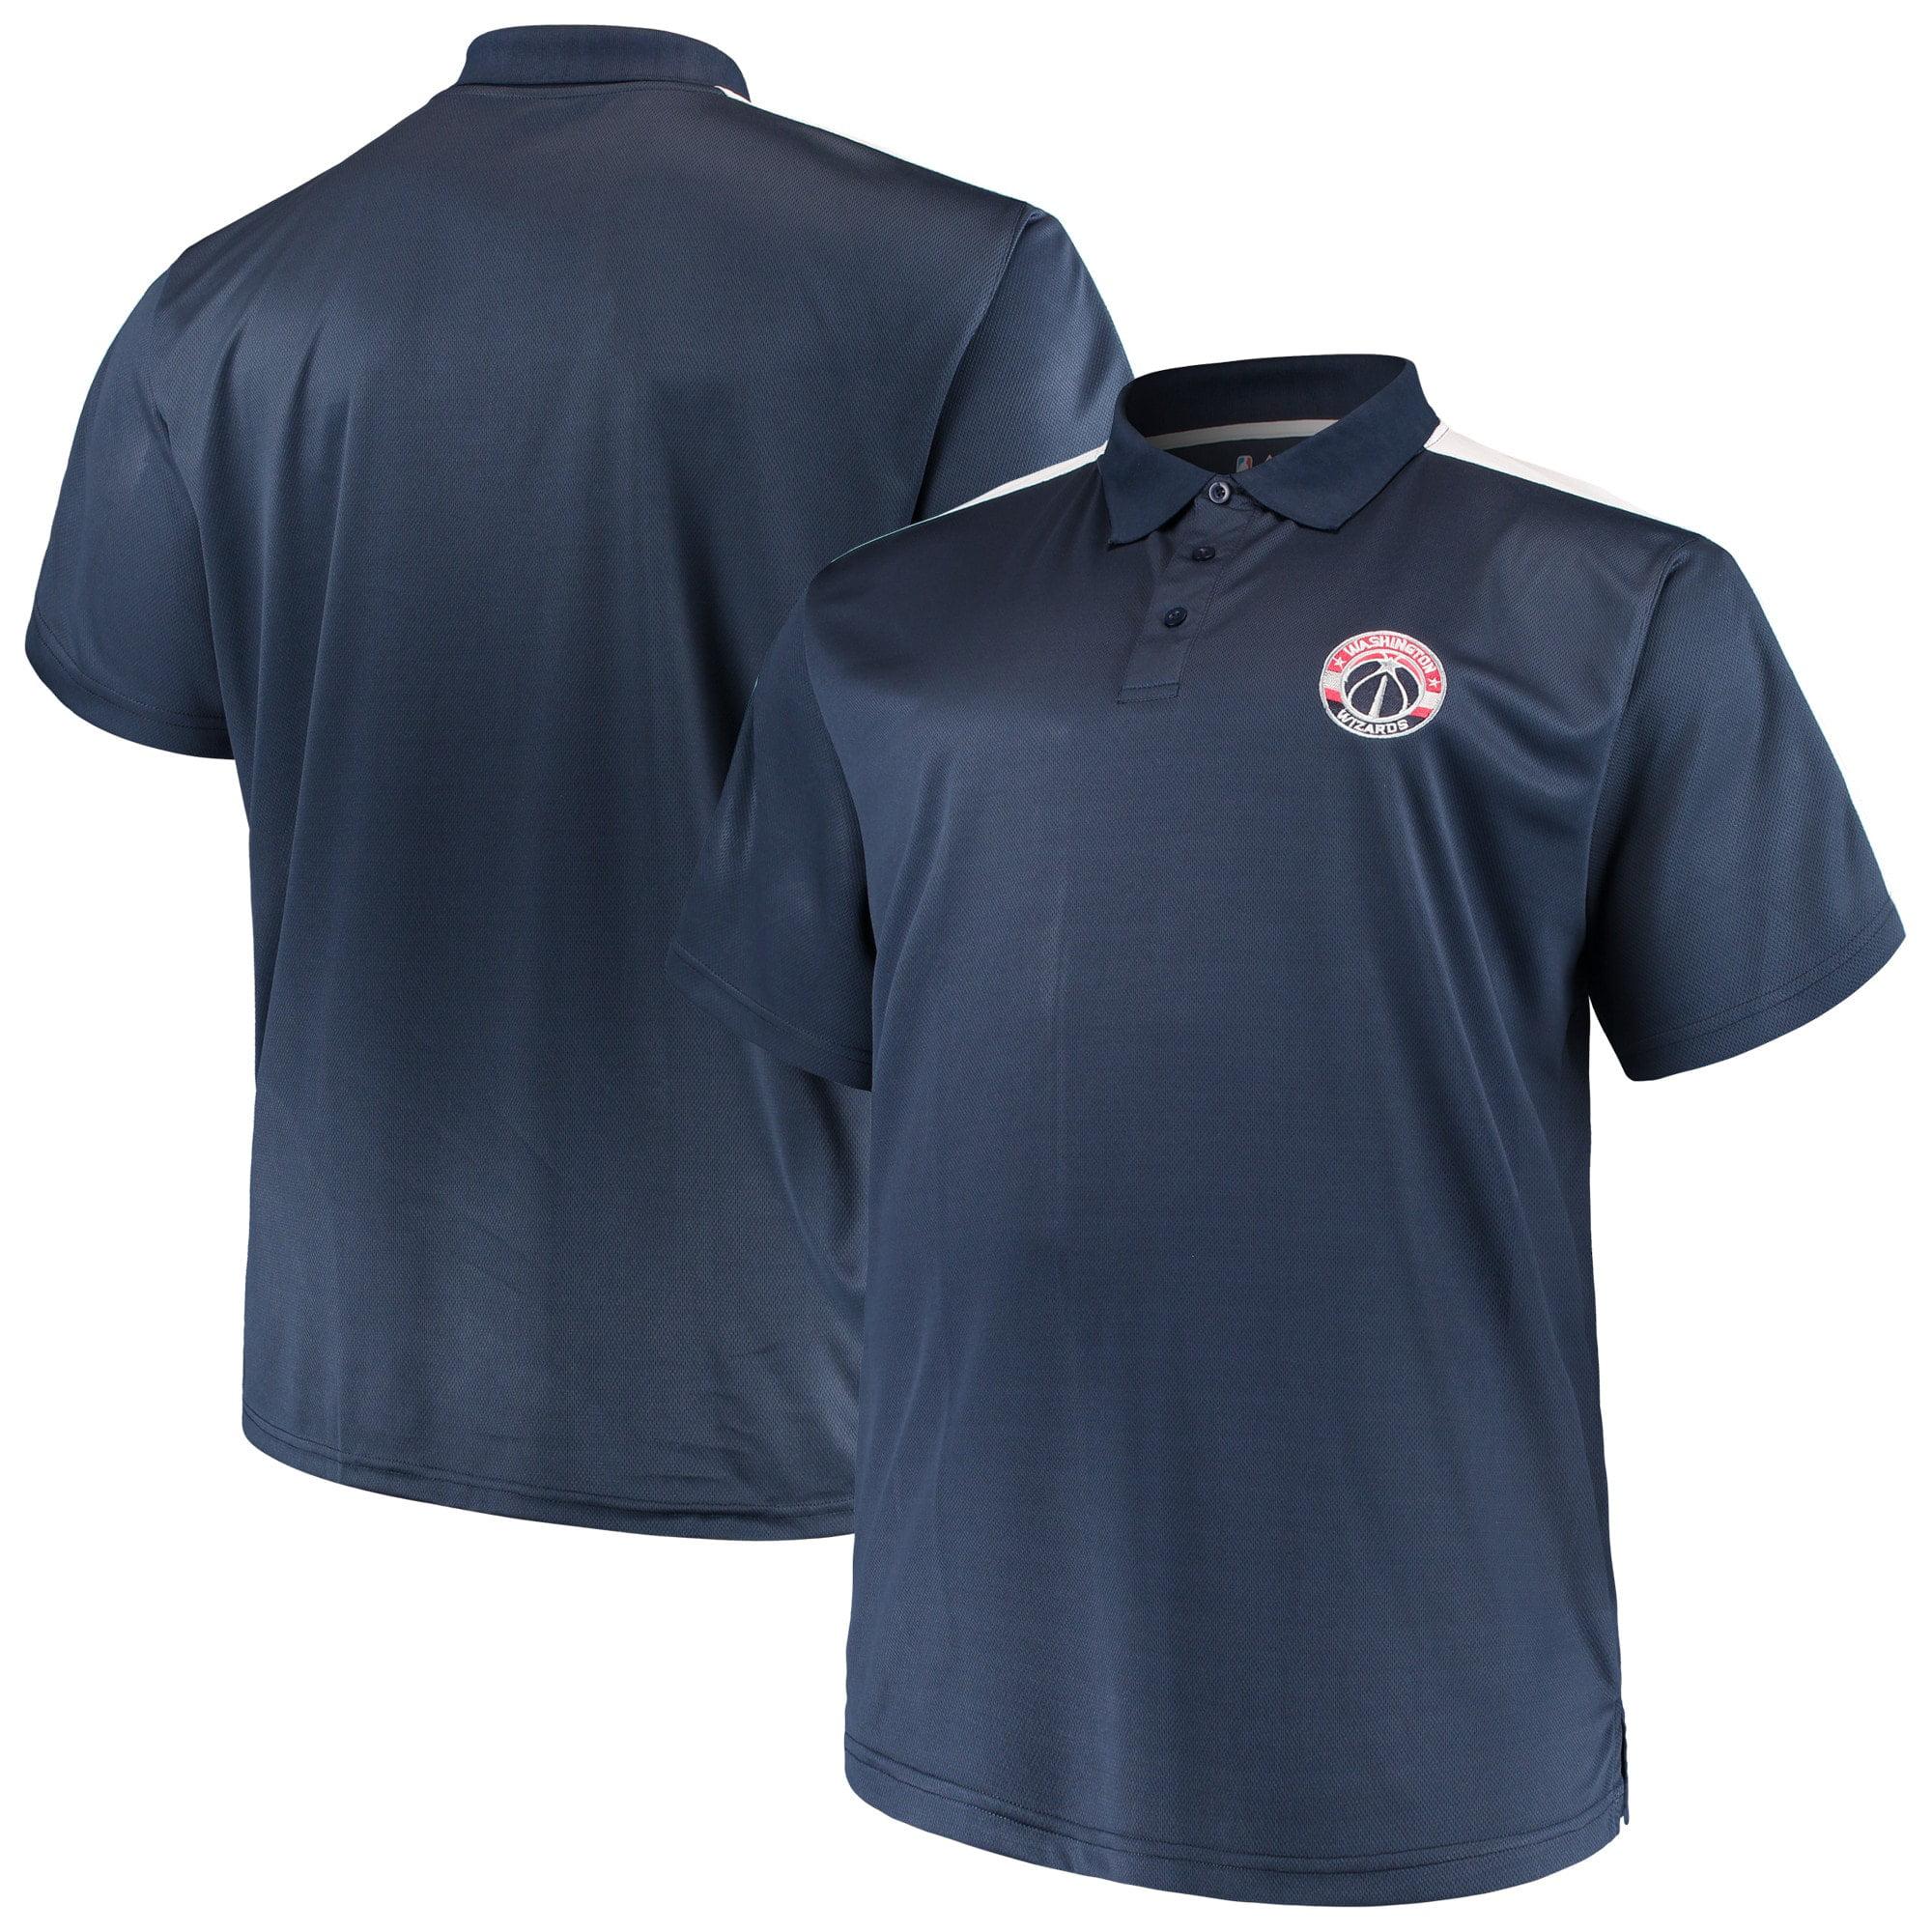 Philadelphia 76ers Moist Management Birdseye Mens Polo Shirt Big /& Tall Sizes